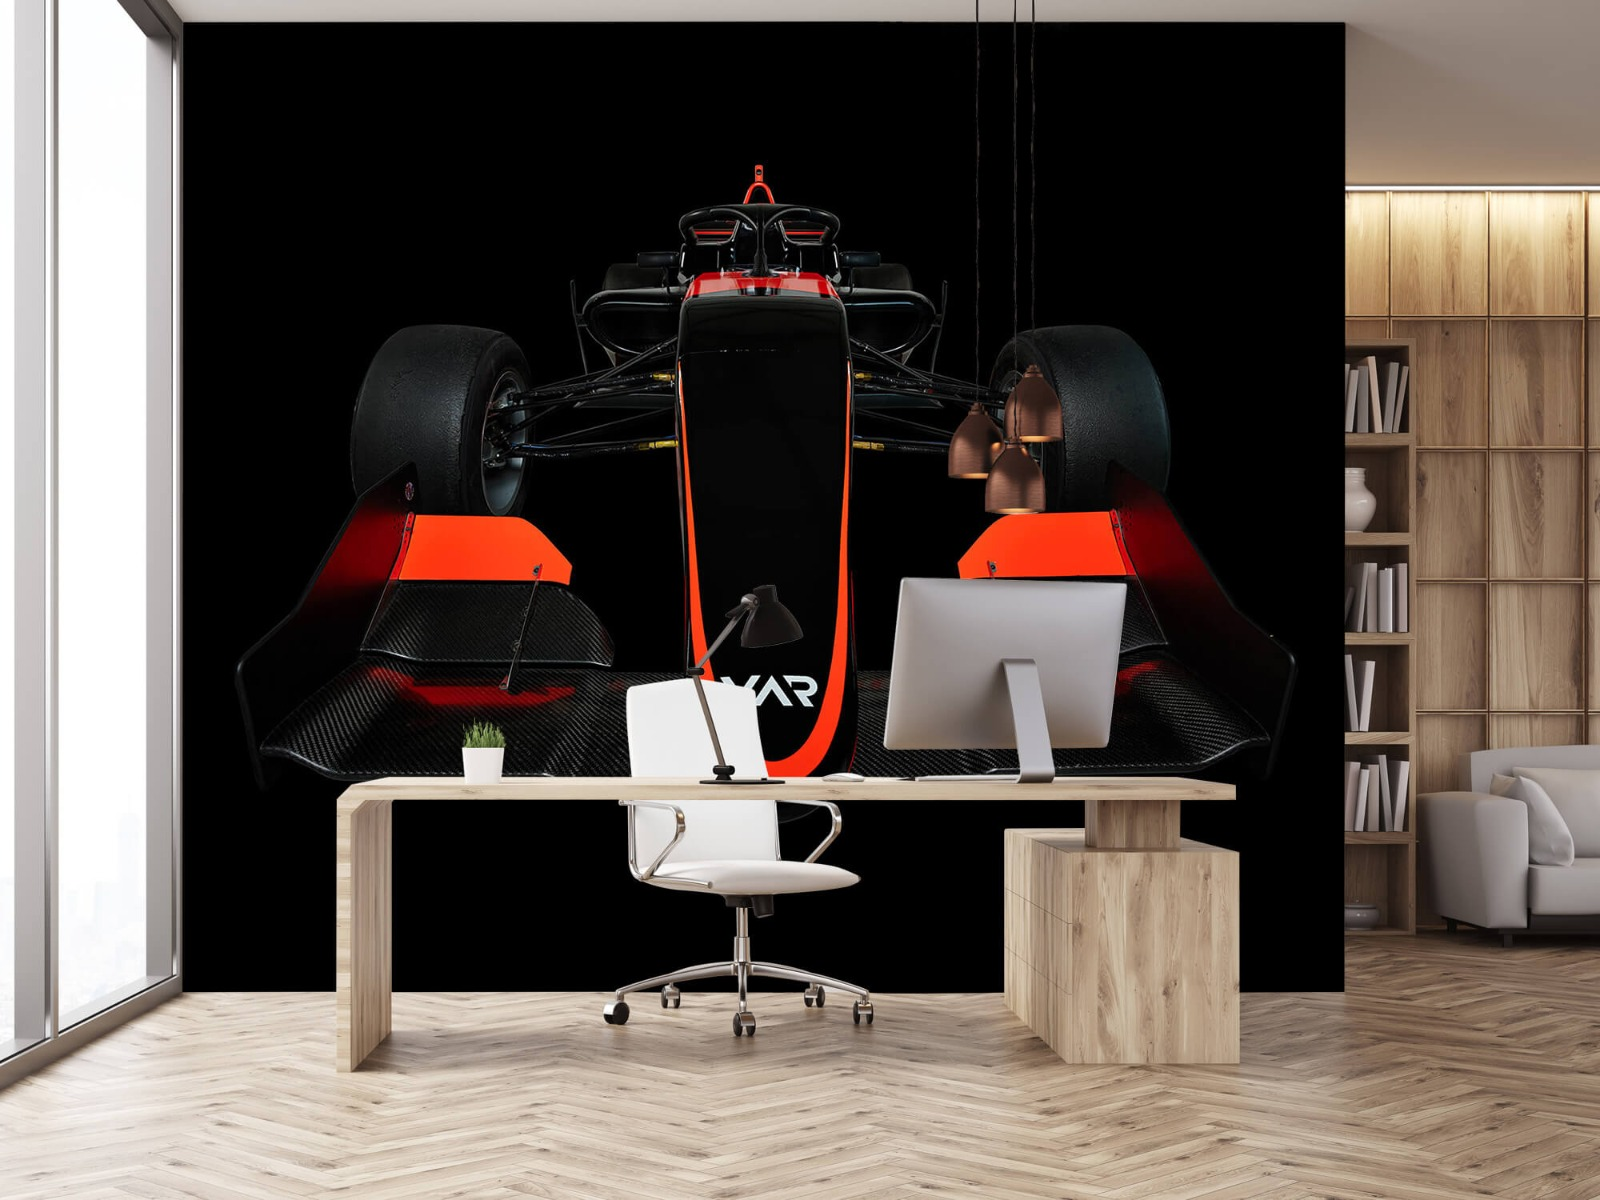 Sportauto's - Formule 3 - Lower front view - dark - Slaapkamer 24